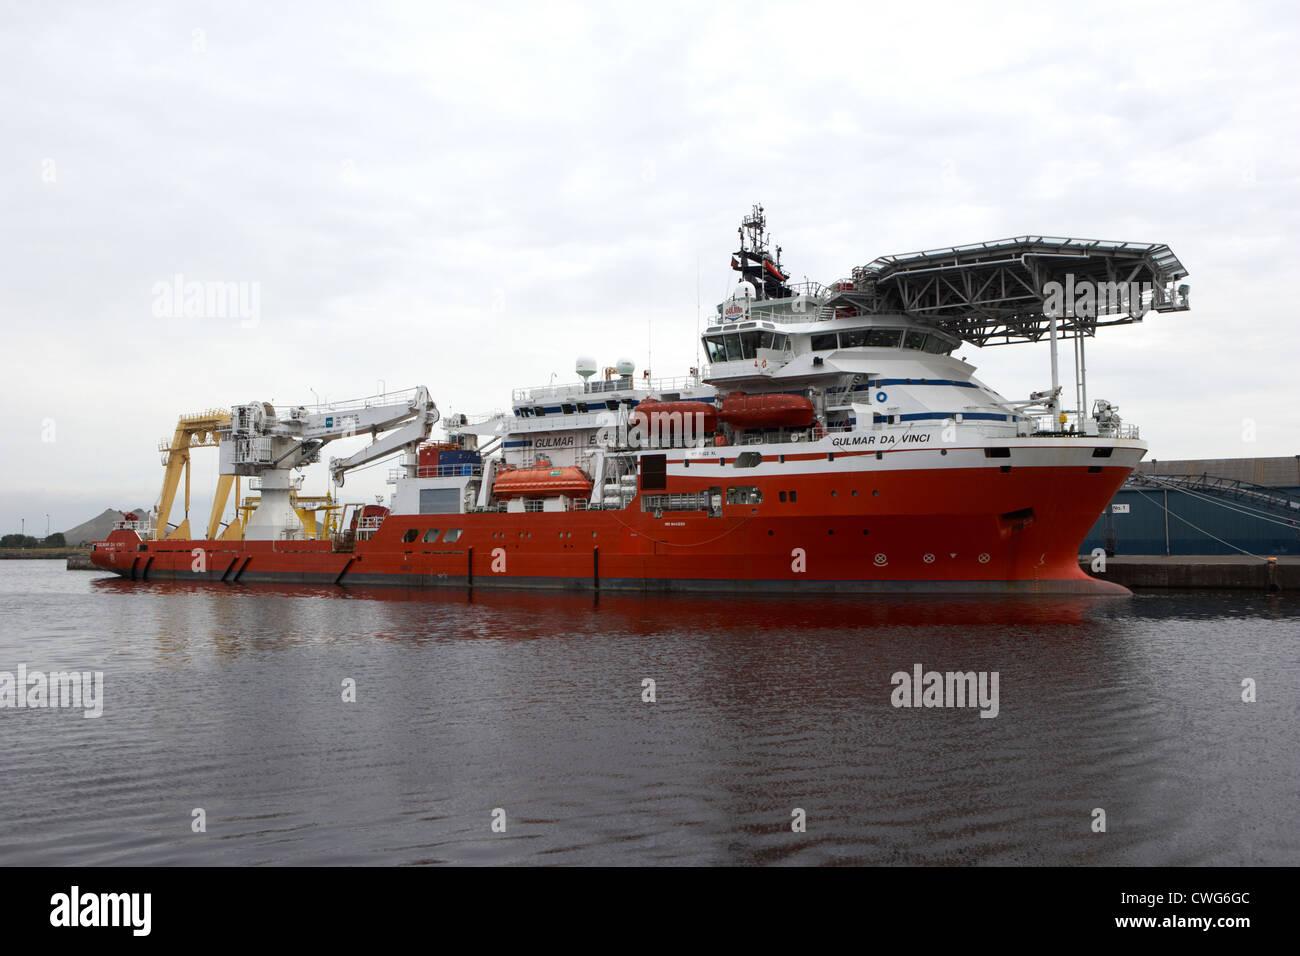 Gulmar da vinci au navire de support de plongée de Leith Docks Edinburgh, Scotland, UK, Royaume-Uni Photo Stock